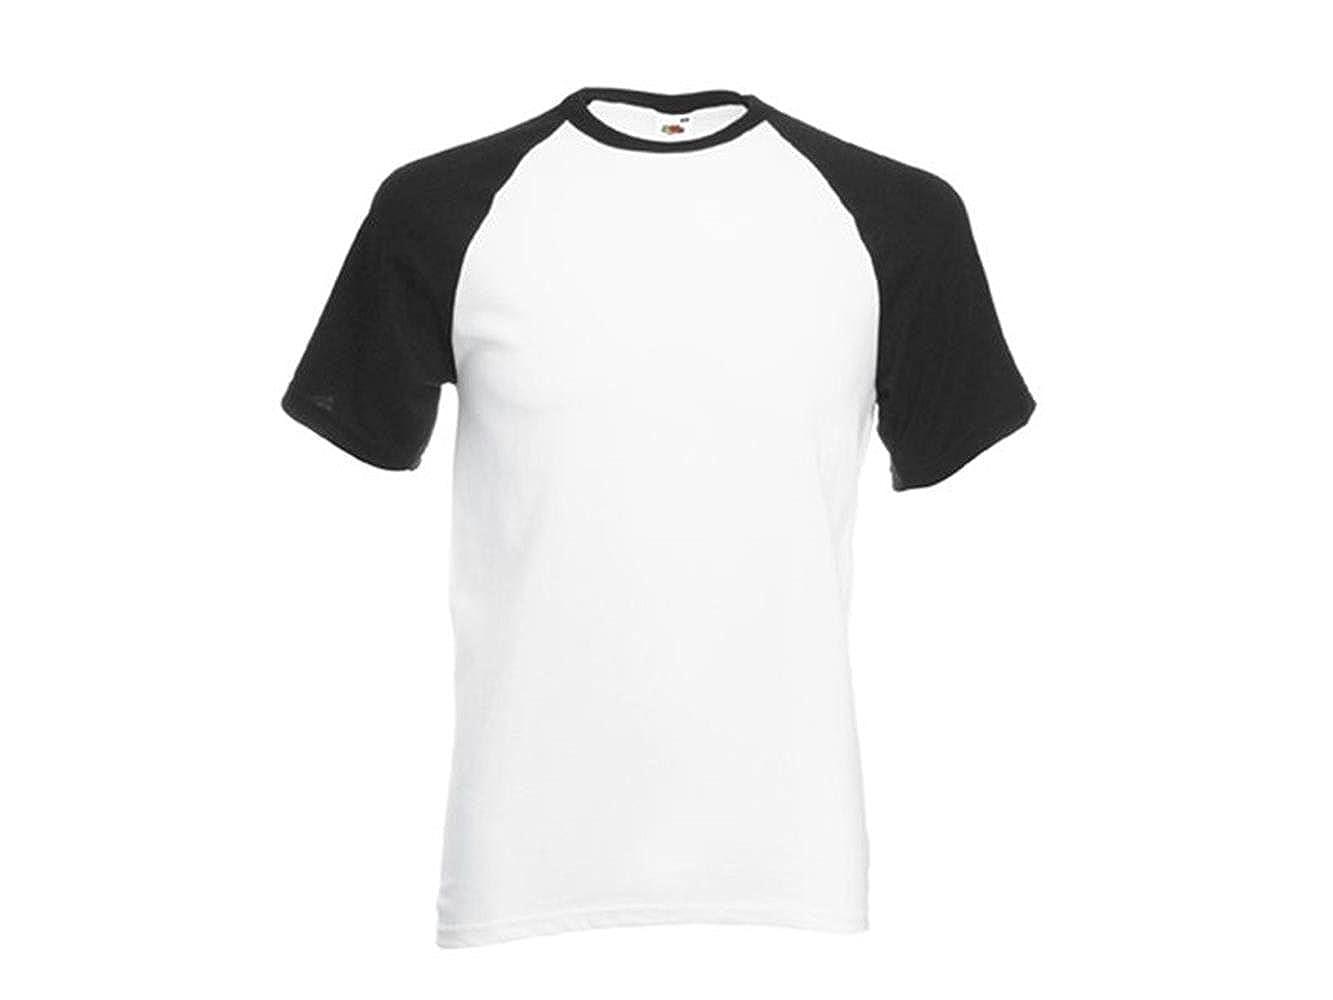 con Manica Lunga Stile Raglan 100/% Cotone Leggera Bianca Raftaar/® Maglia da Baseball Unisex